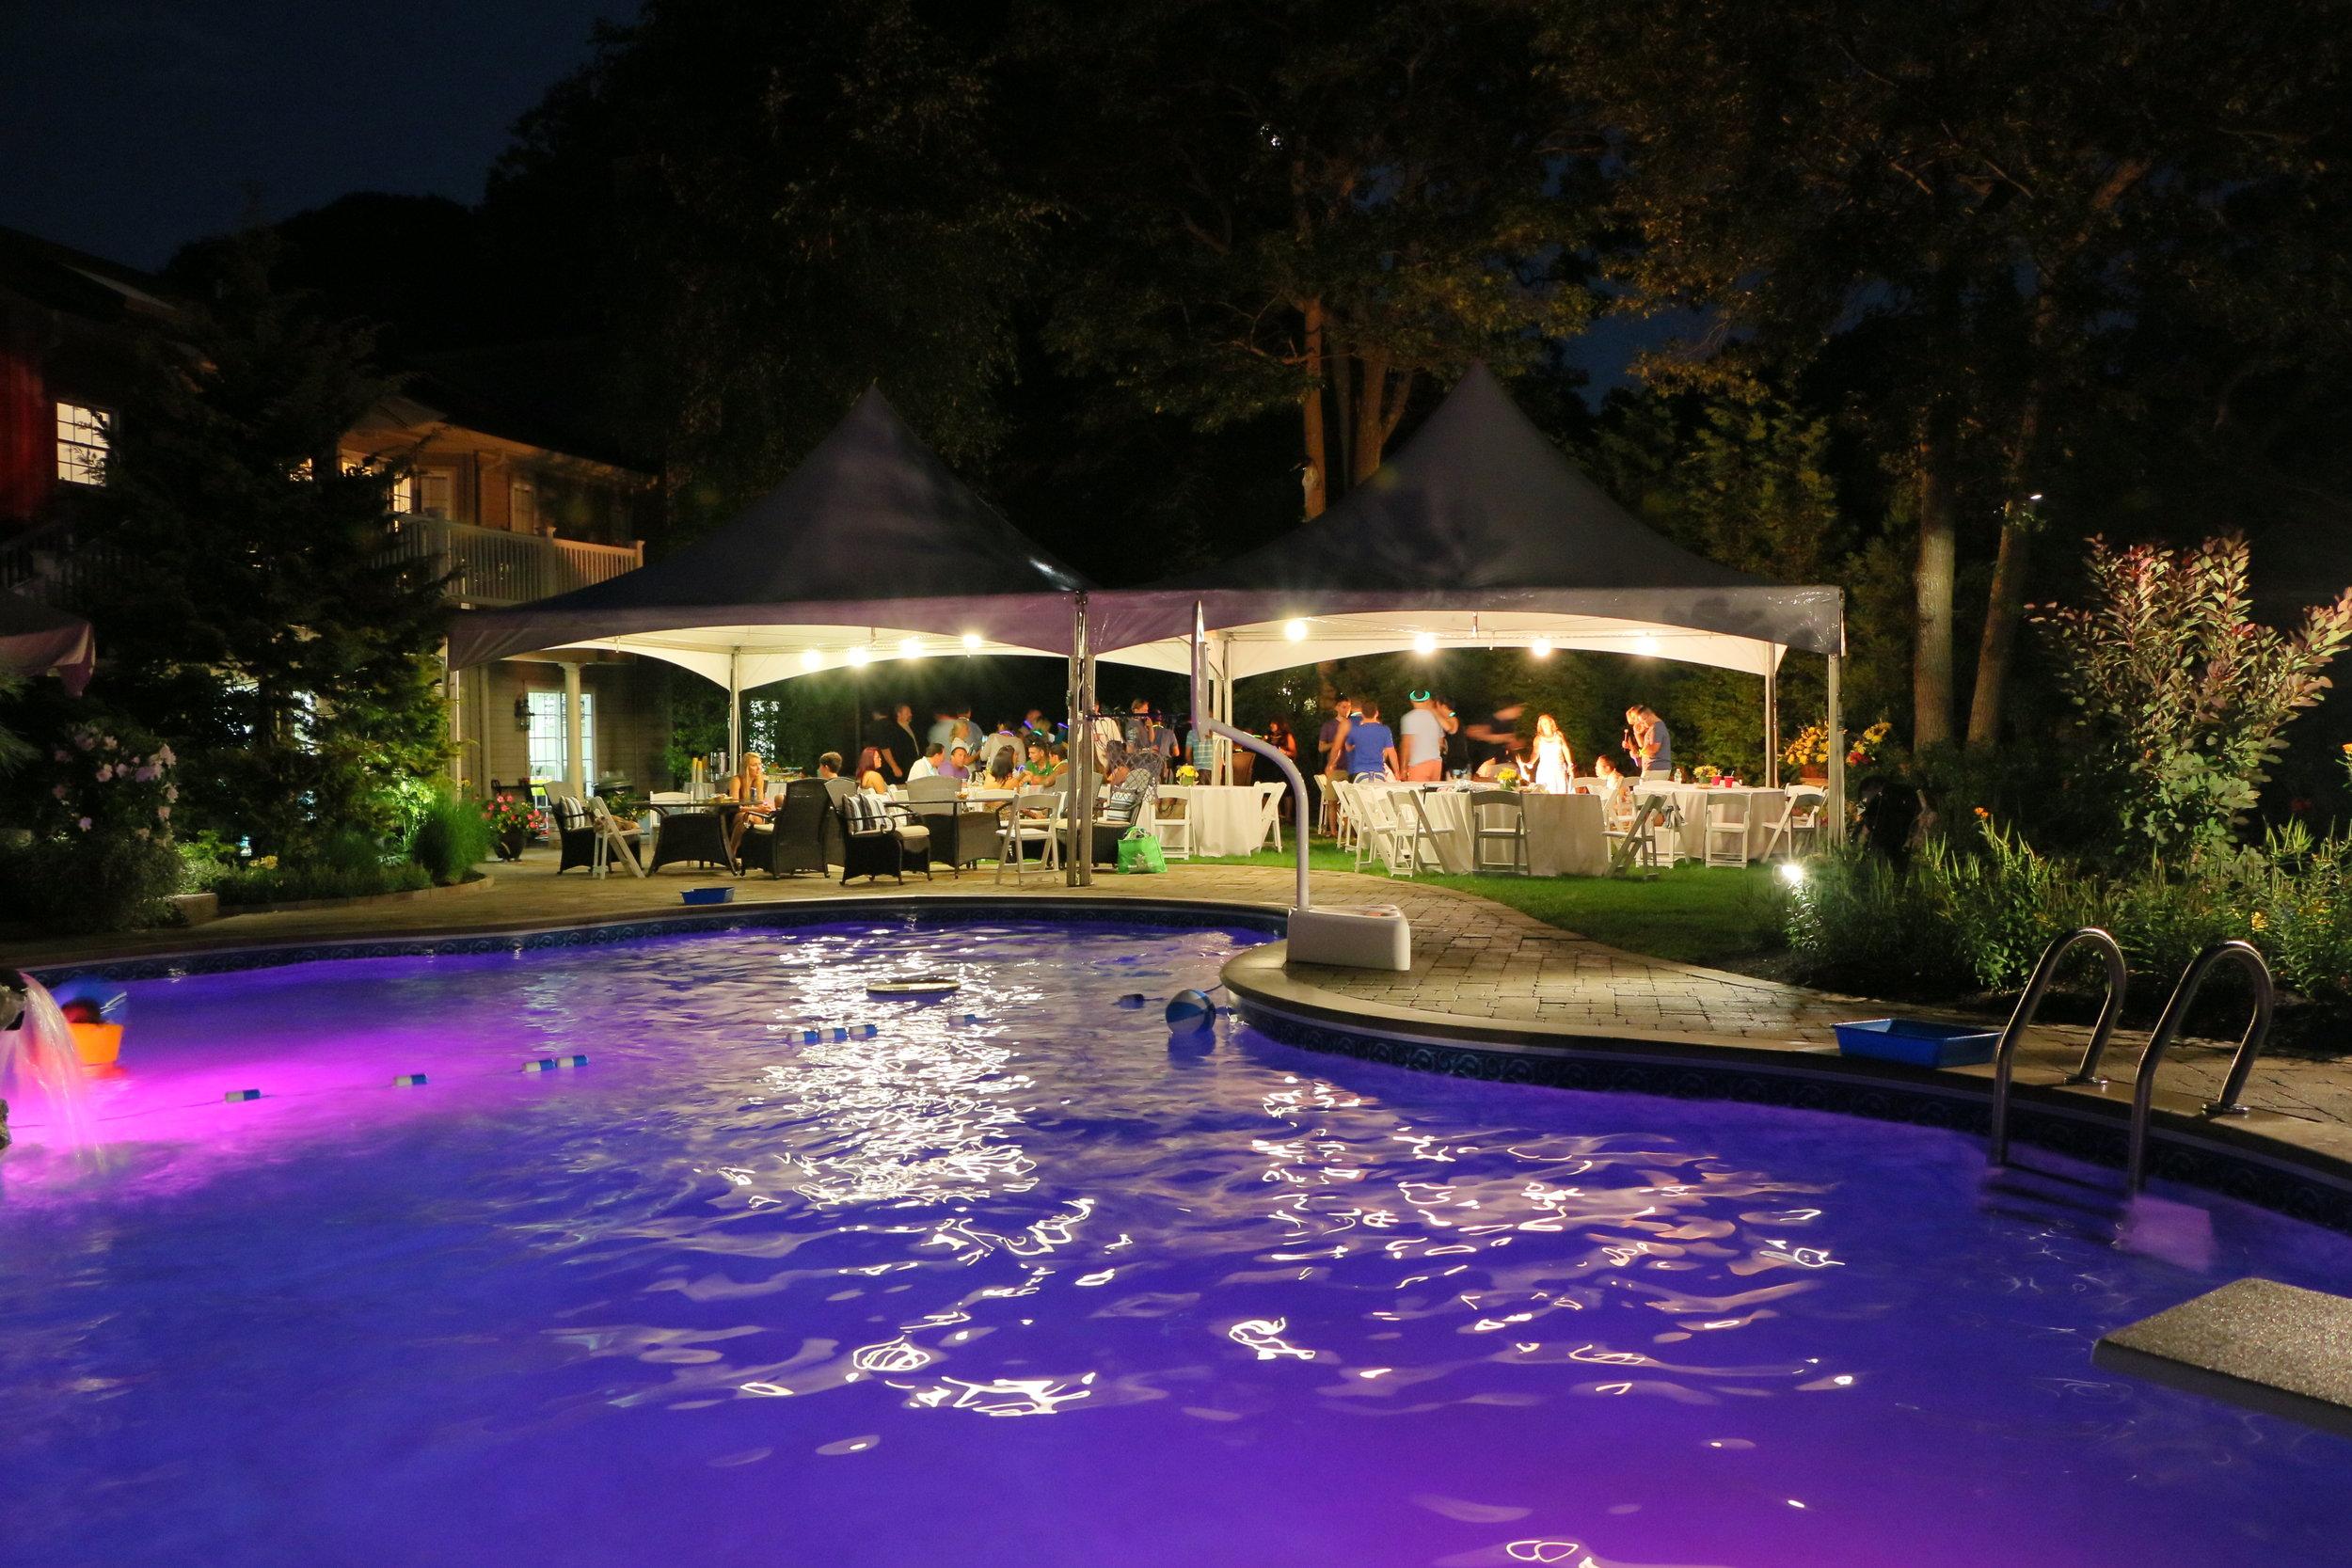 Professional pool arealandscape design company in Long Island, NY